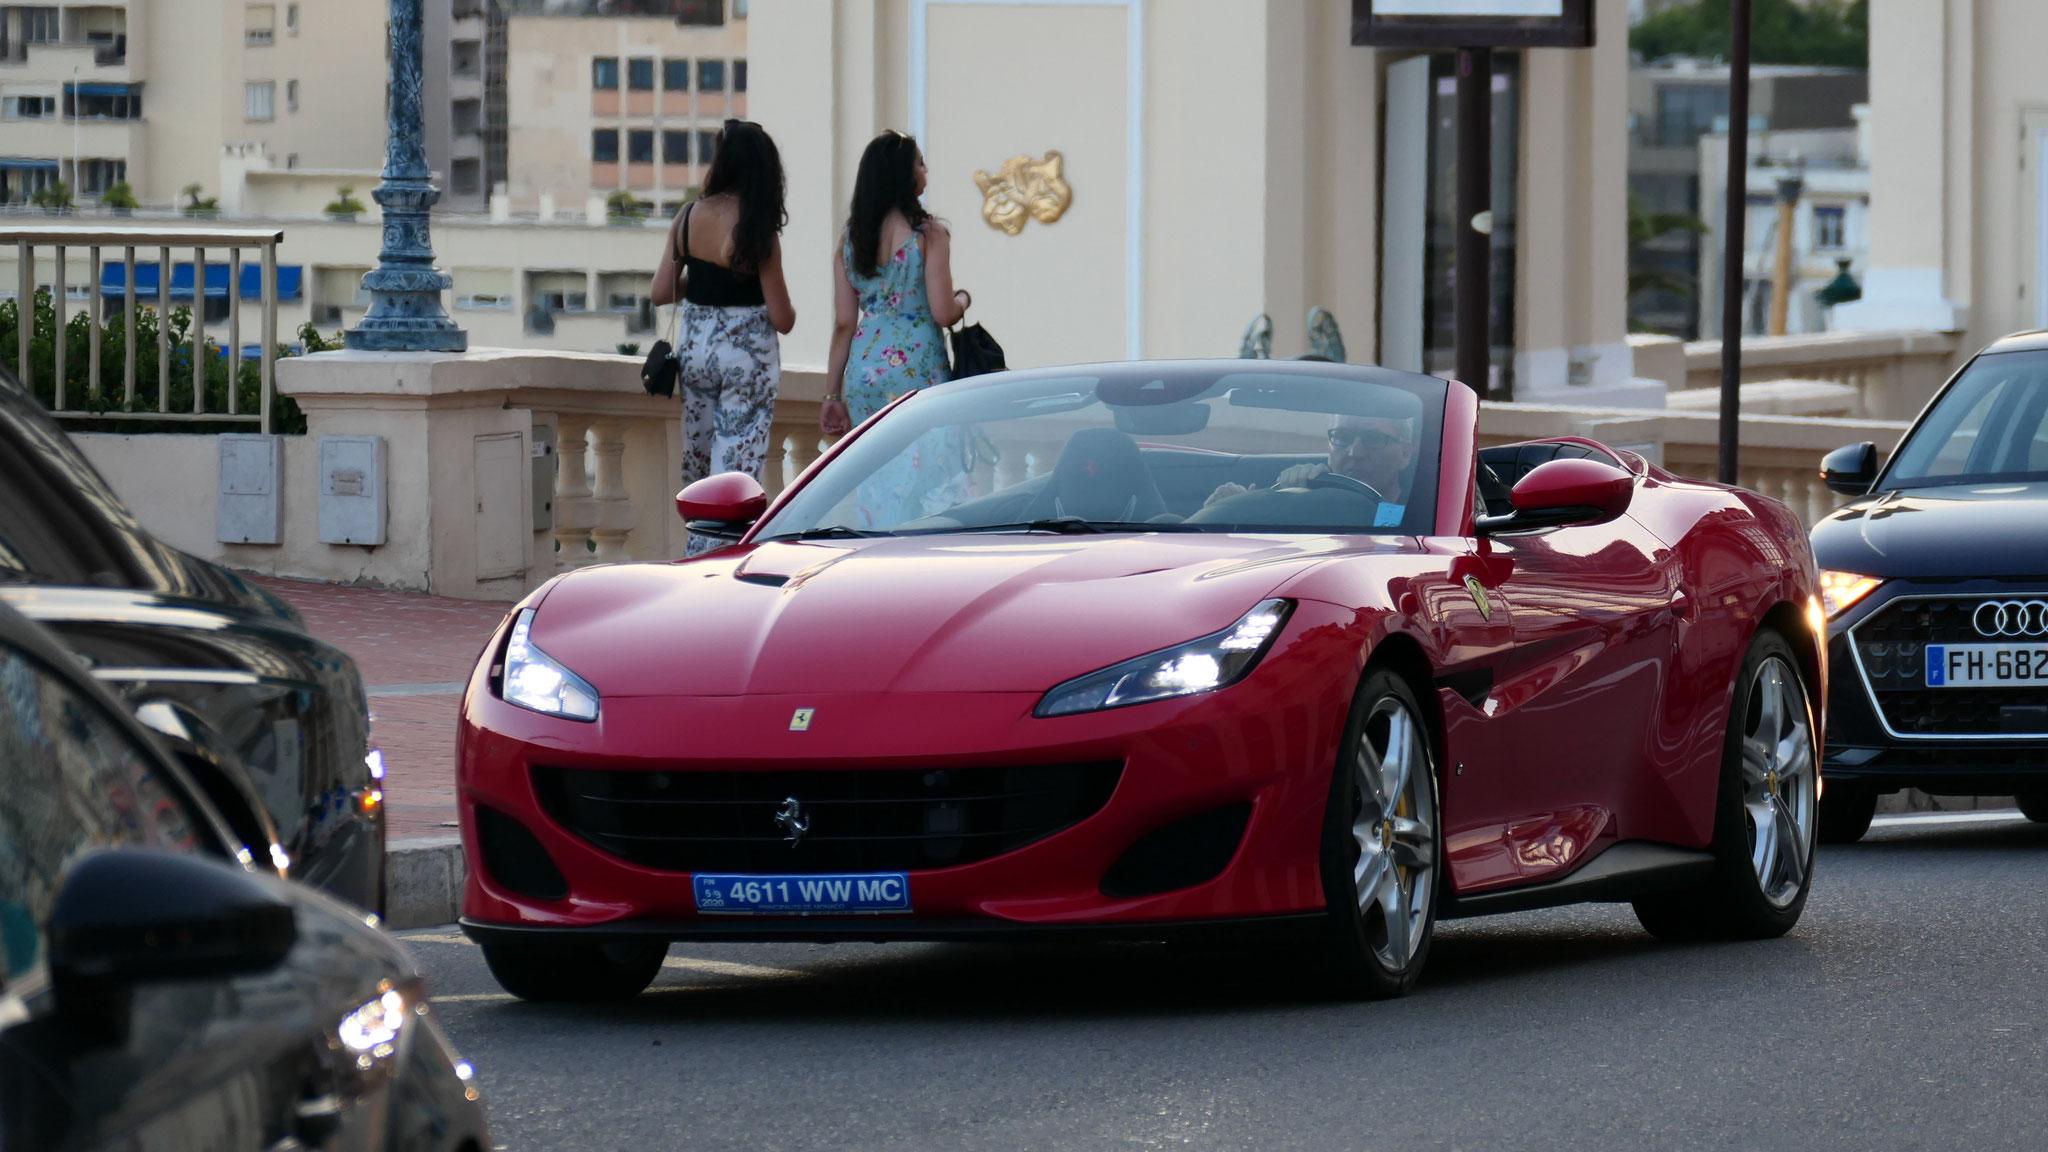 Ferrari Portofino - 4611-WW-MC (MC)